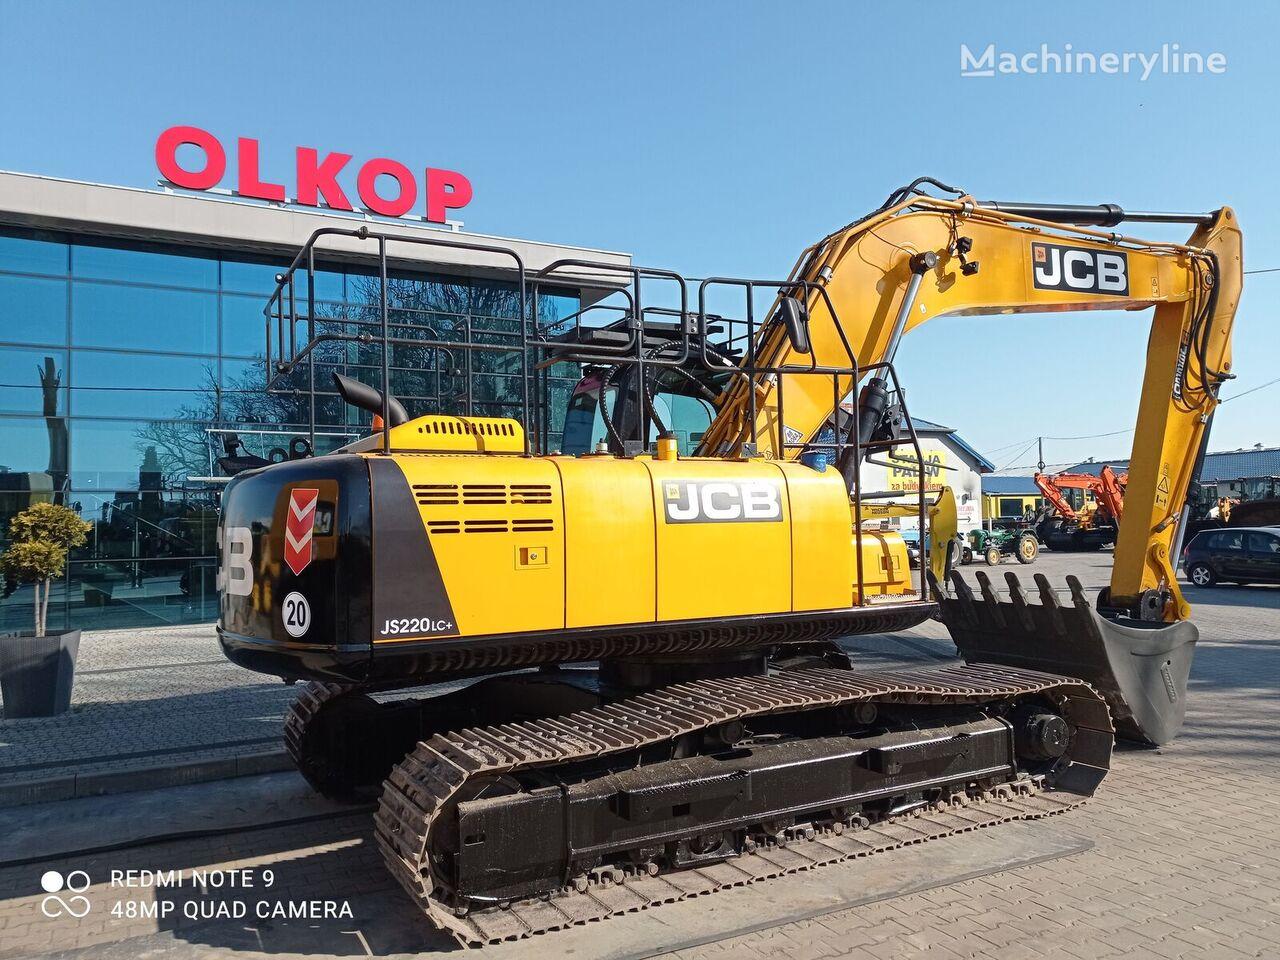 JCB JS 220 LC+ tracked excavator